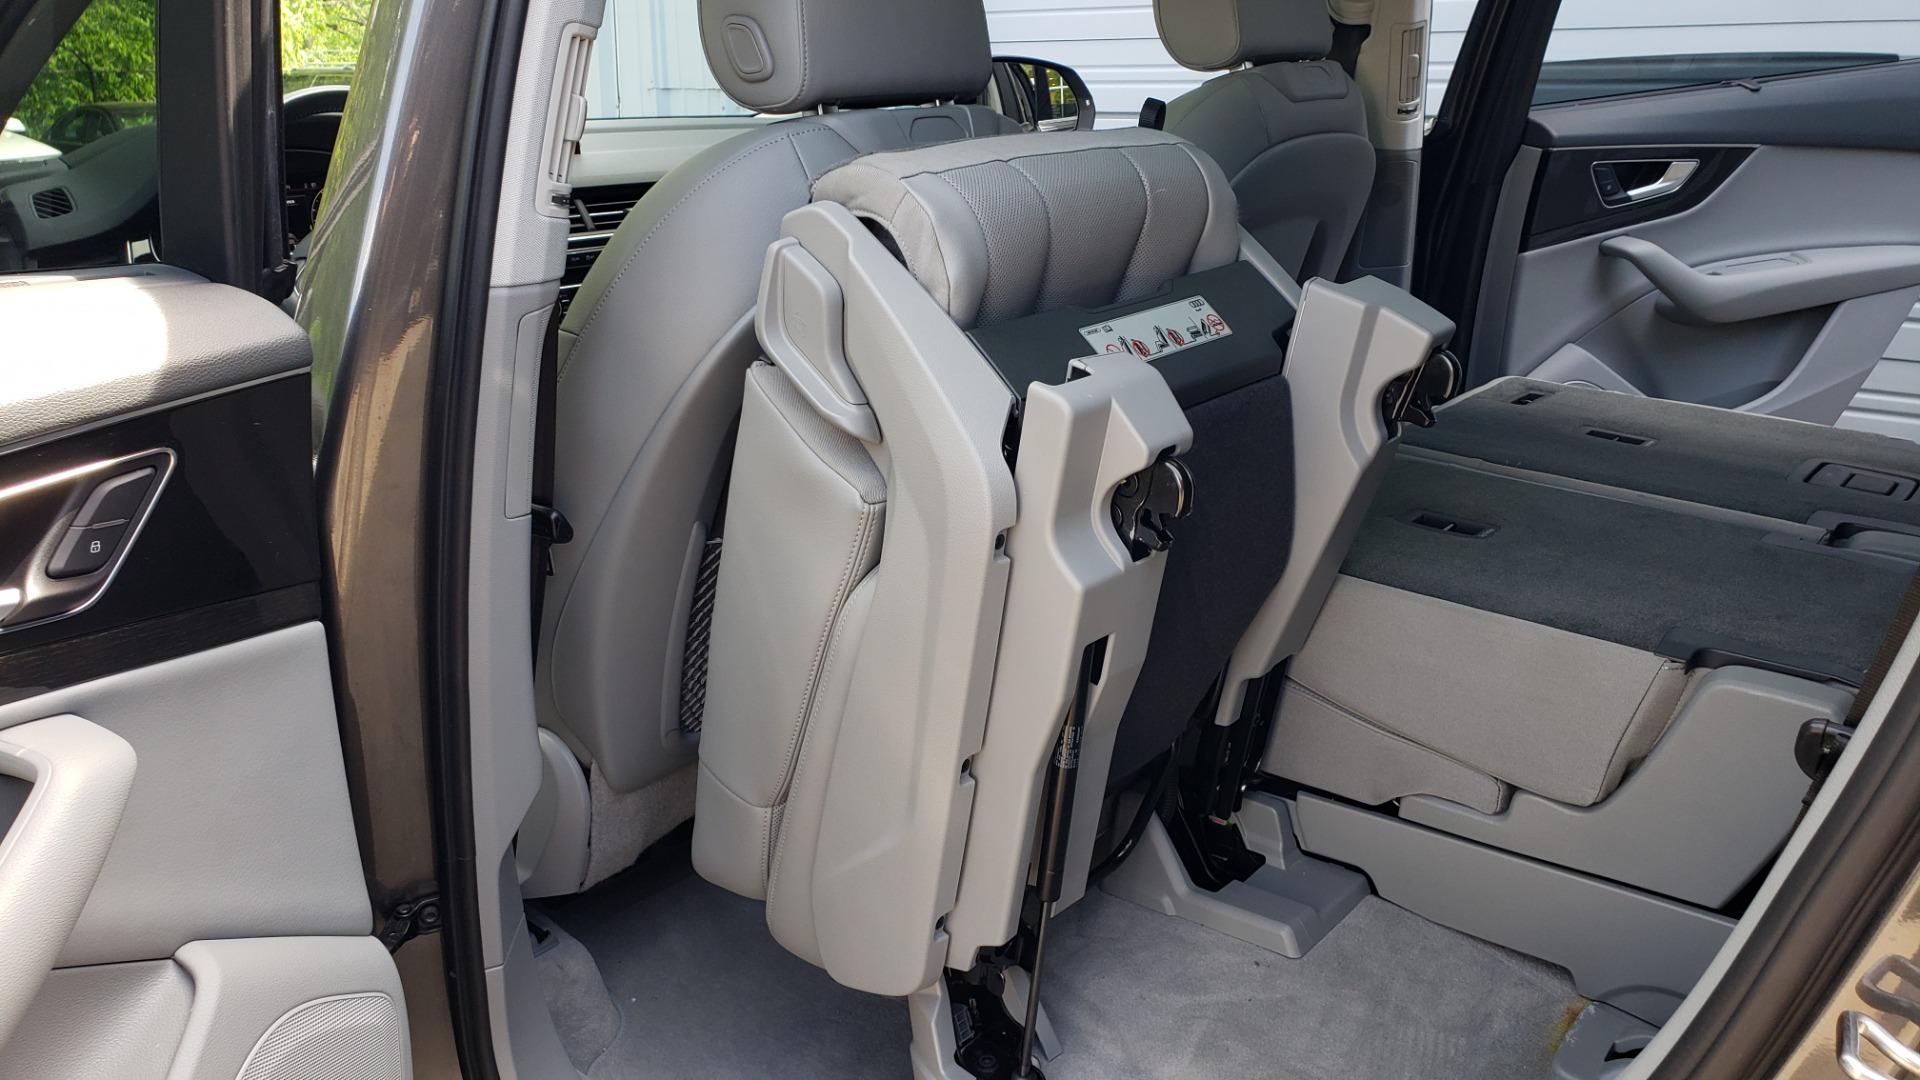 Used 2018 Audi Q7 PRESTIGE TIPTRONIC / NAV / SUNROOF / ADAPTIVE PKG / DRVR ASST / CLD WTHR /  for sale $49,995 at Formula Imports in Charlotte NC 28227 82